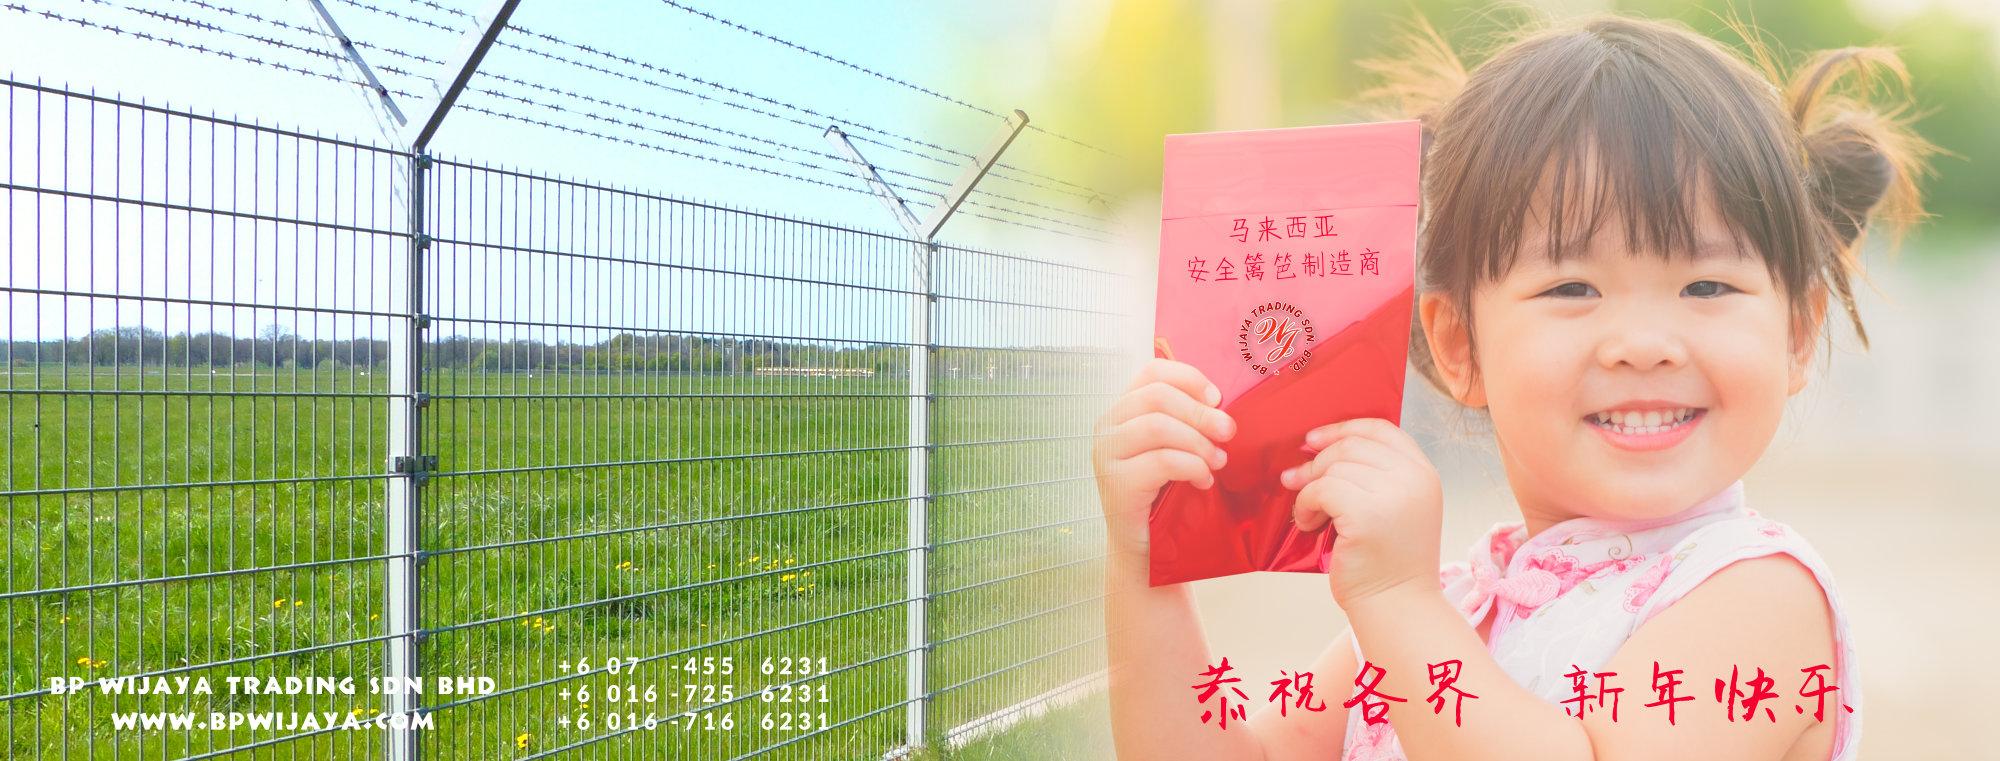 鼠年快乐 农历新年 2020 马来西亚安全篱笆制造商 Chinese New Year 2020 Greeting from BP Wijaya Security Fence Manufacturer Malaysia A01